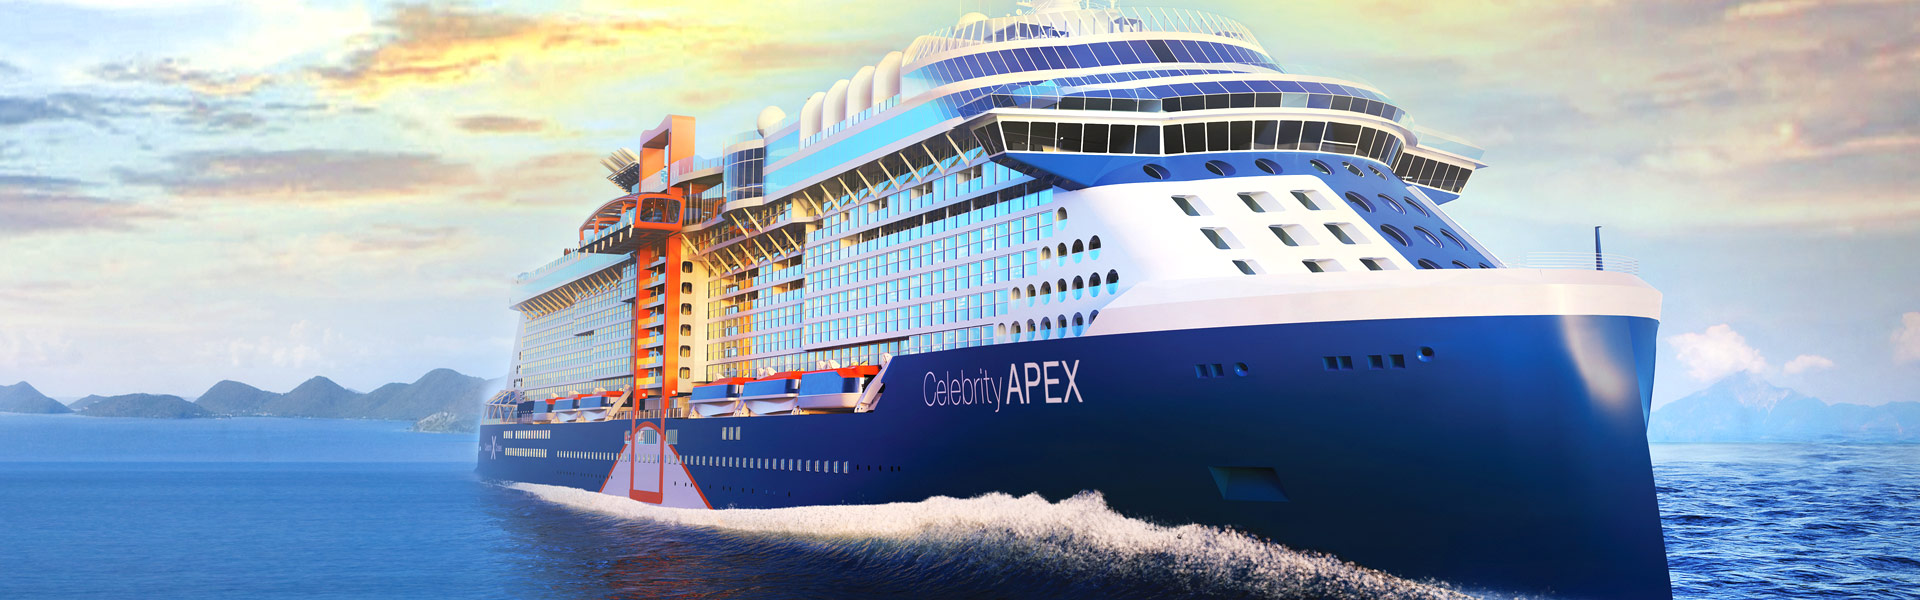 Celebrity Apex Cruise Ship Exterior